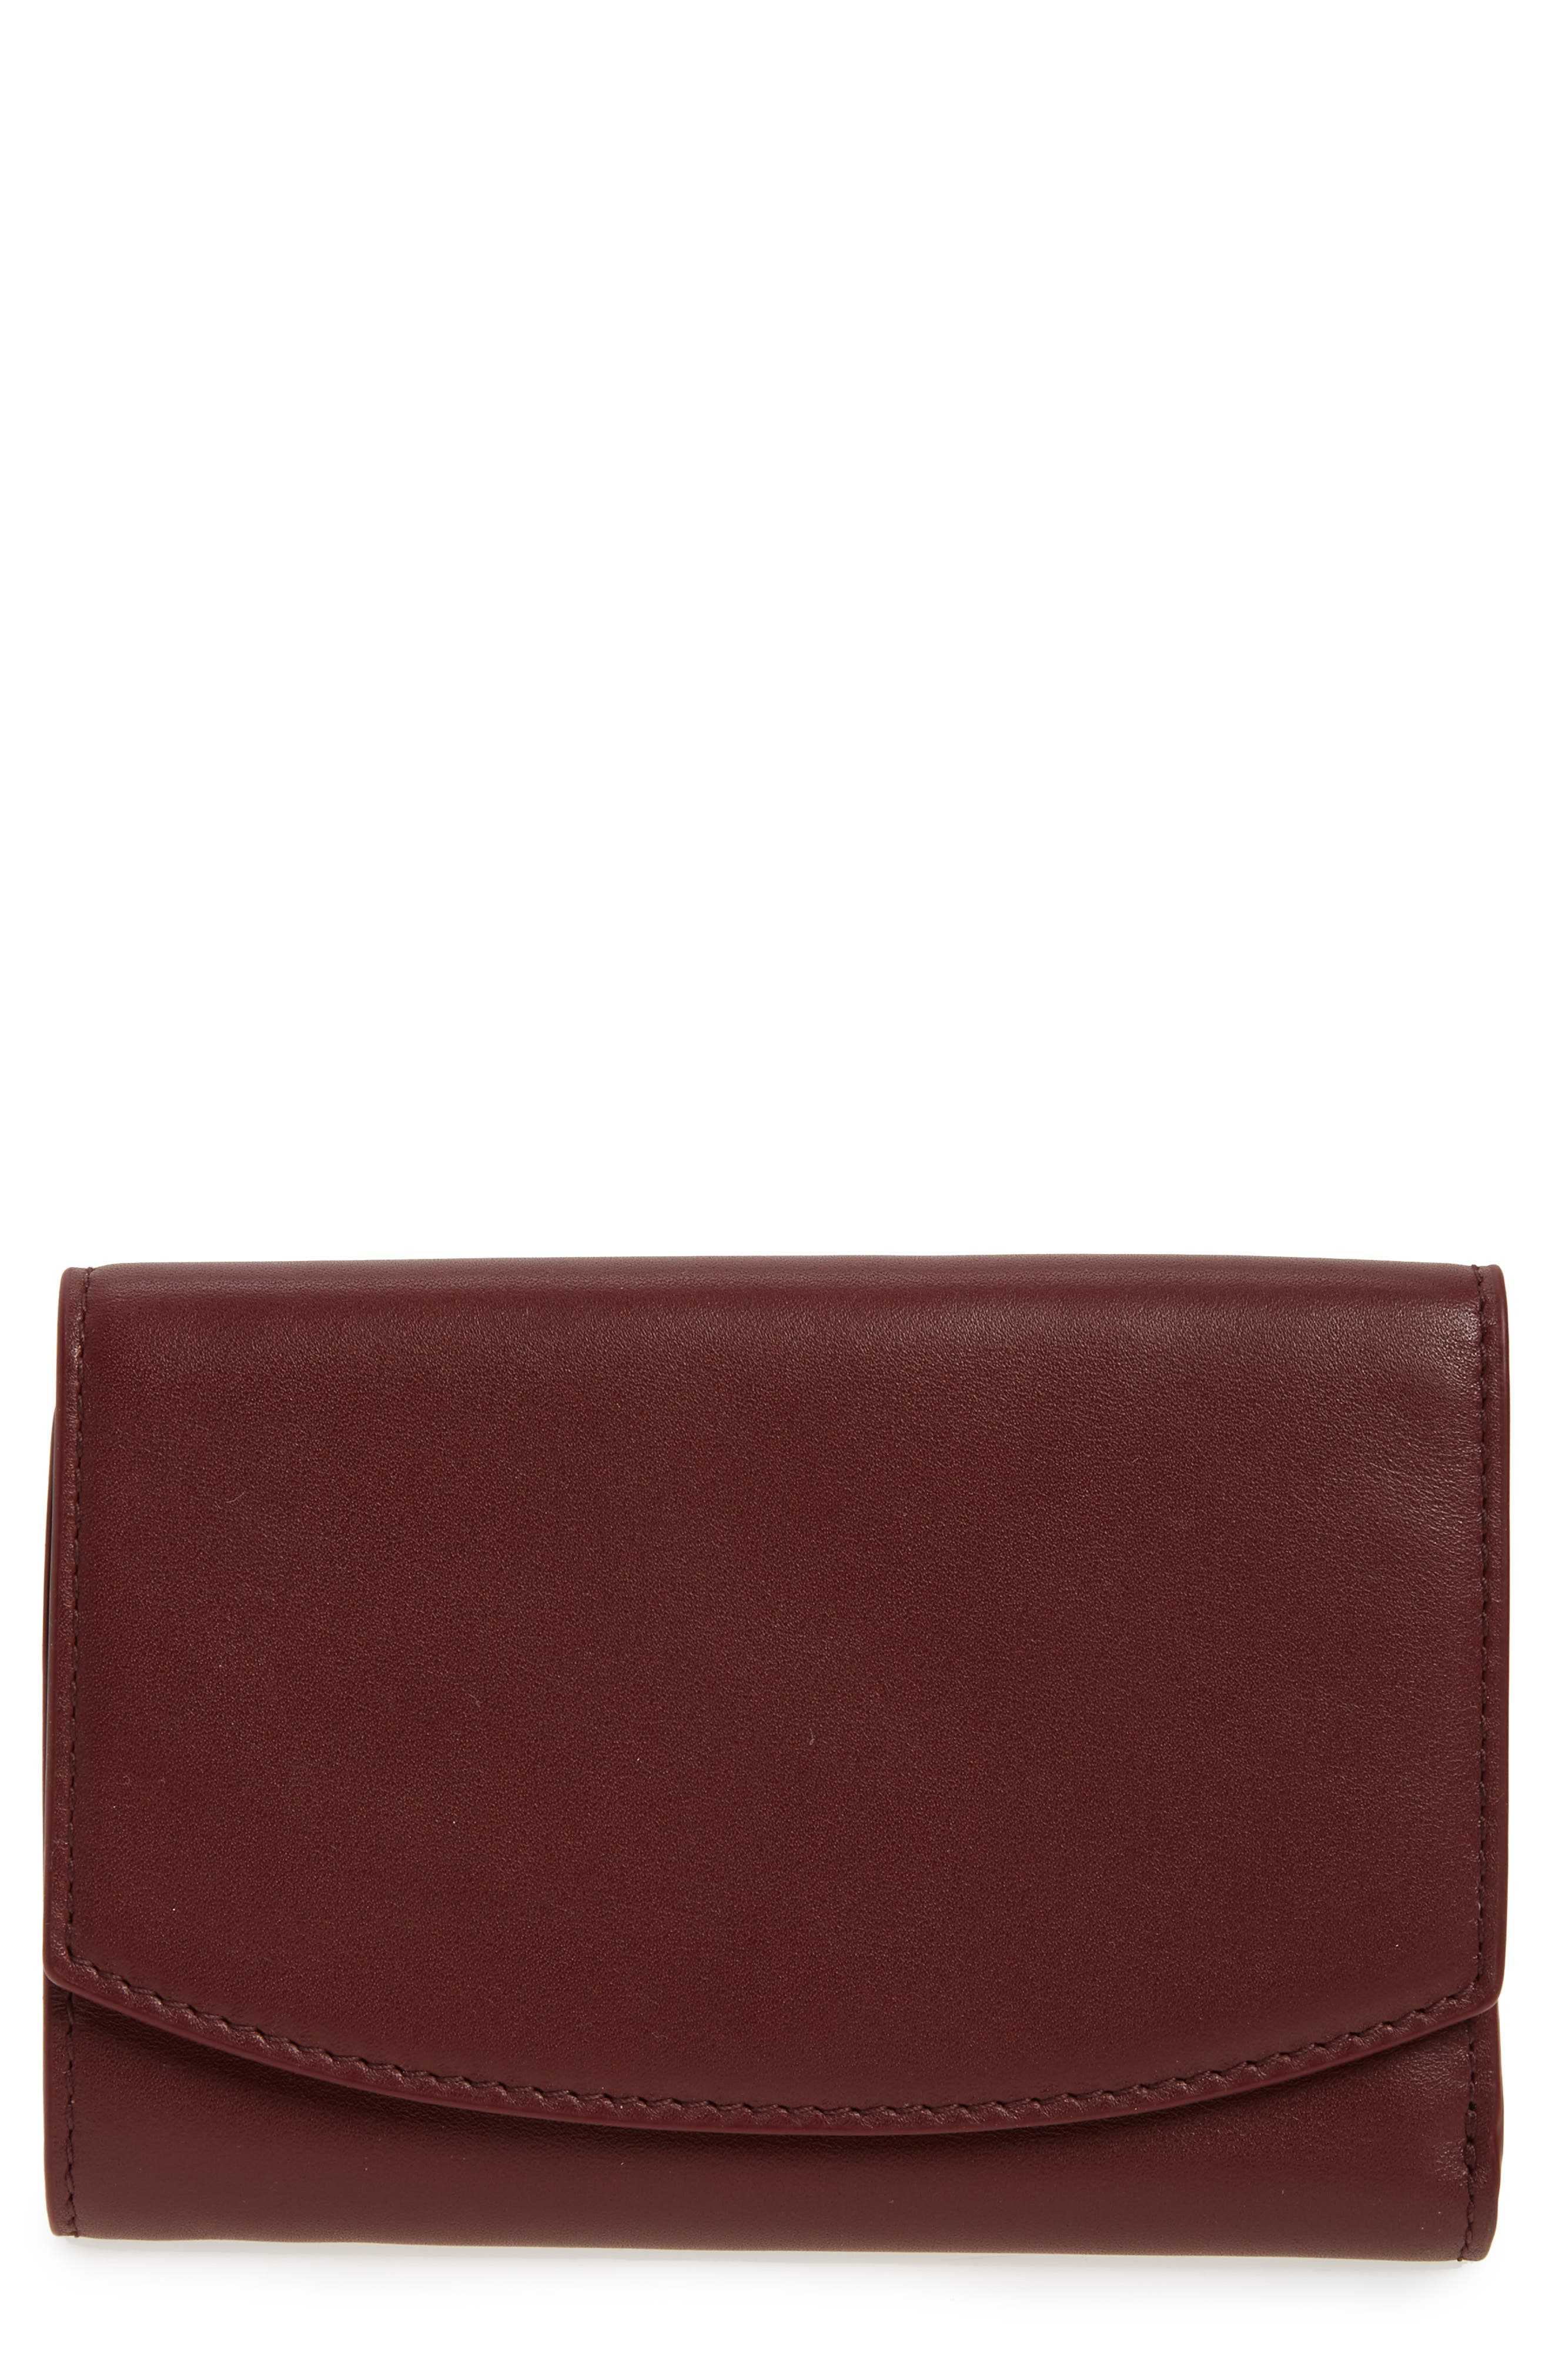 Skagen Compact Flap Leather Wallet